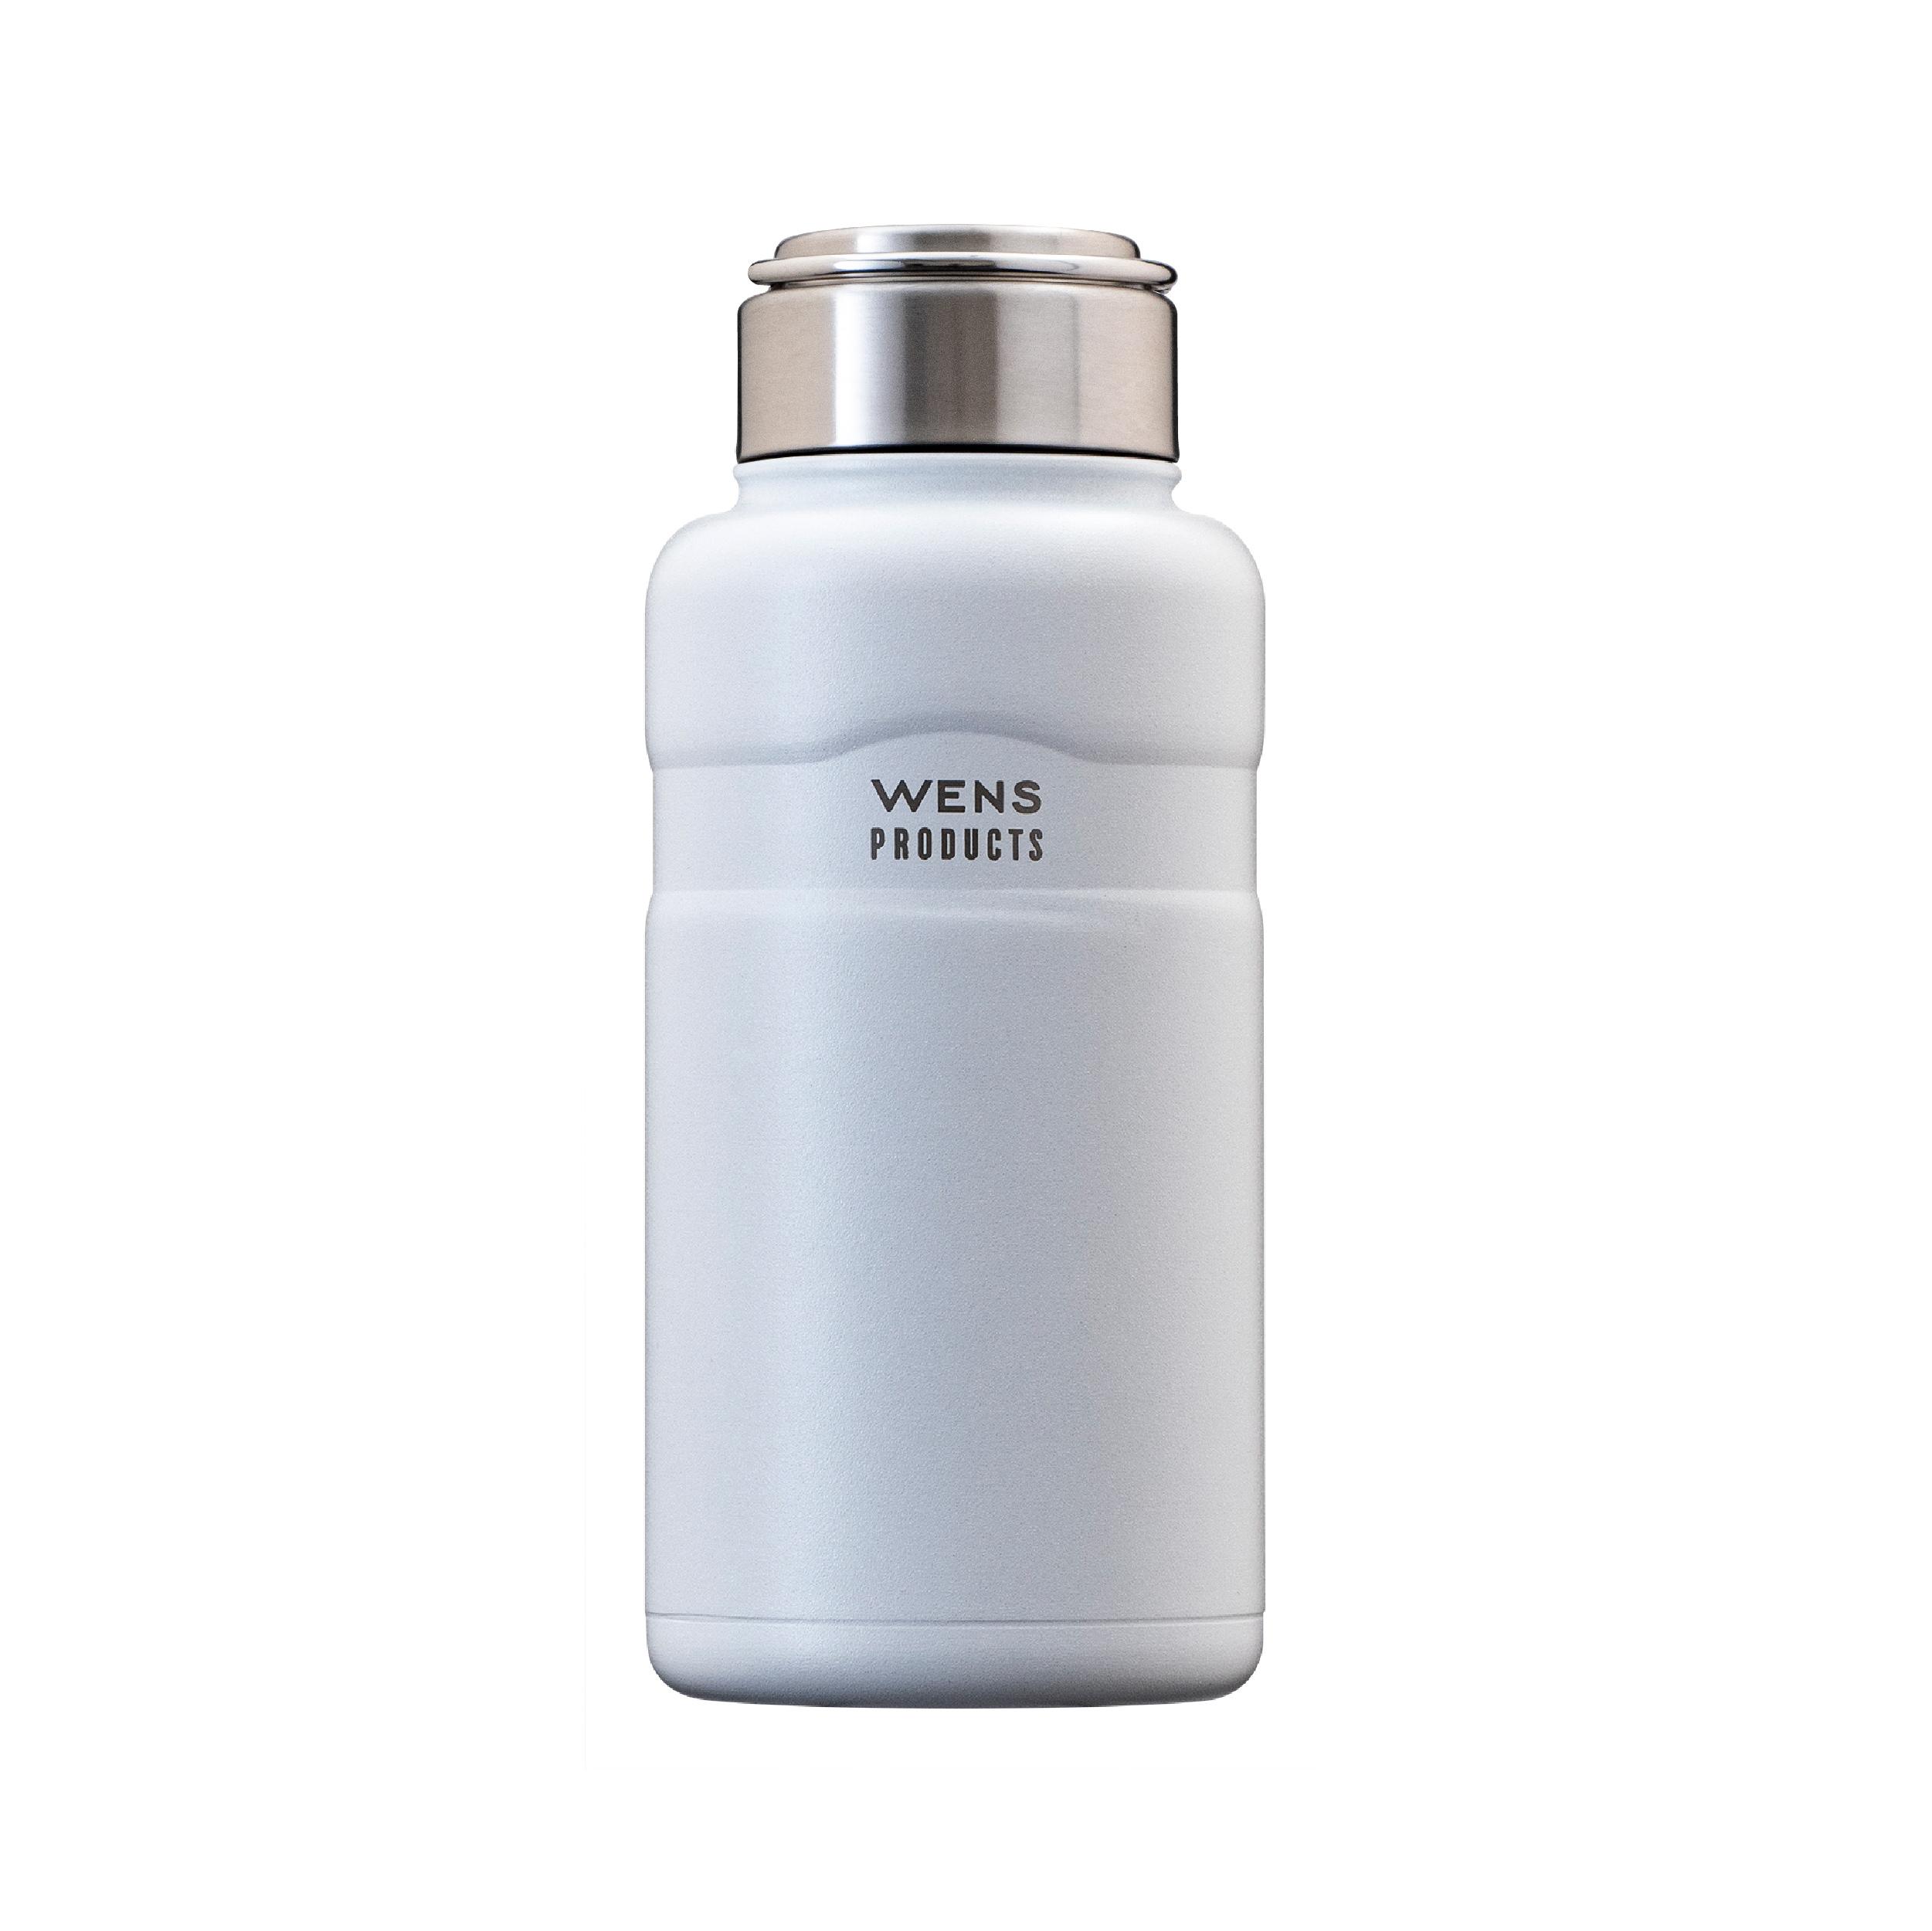 Wens ハンドル付きスクリューボトル 750ml ホワイト